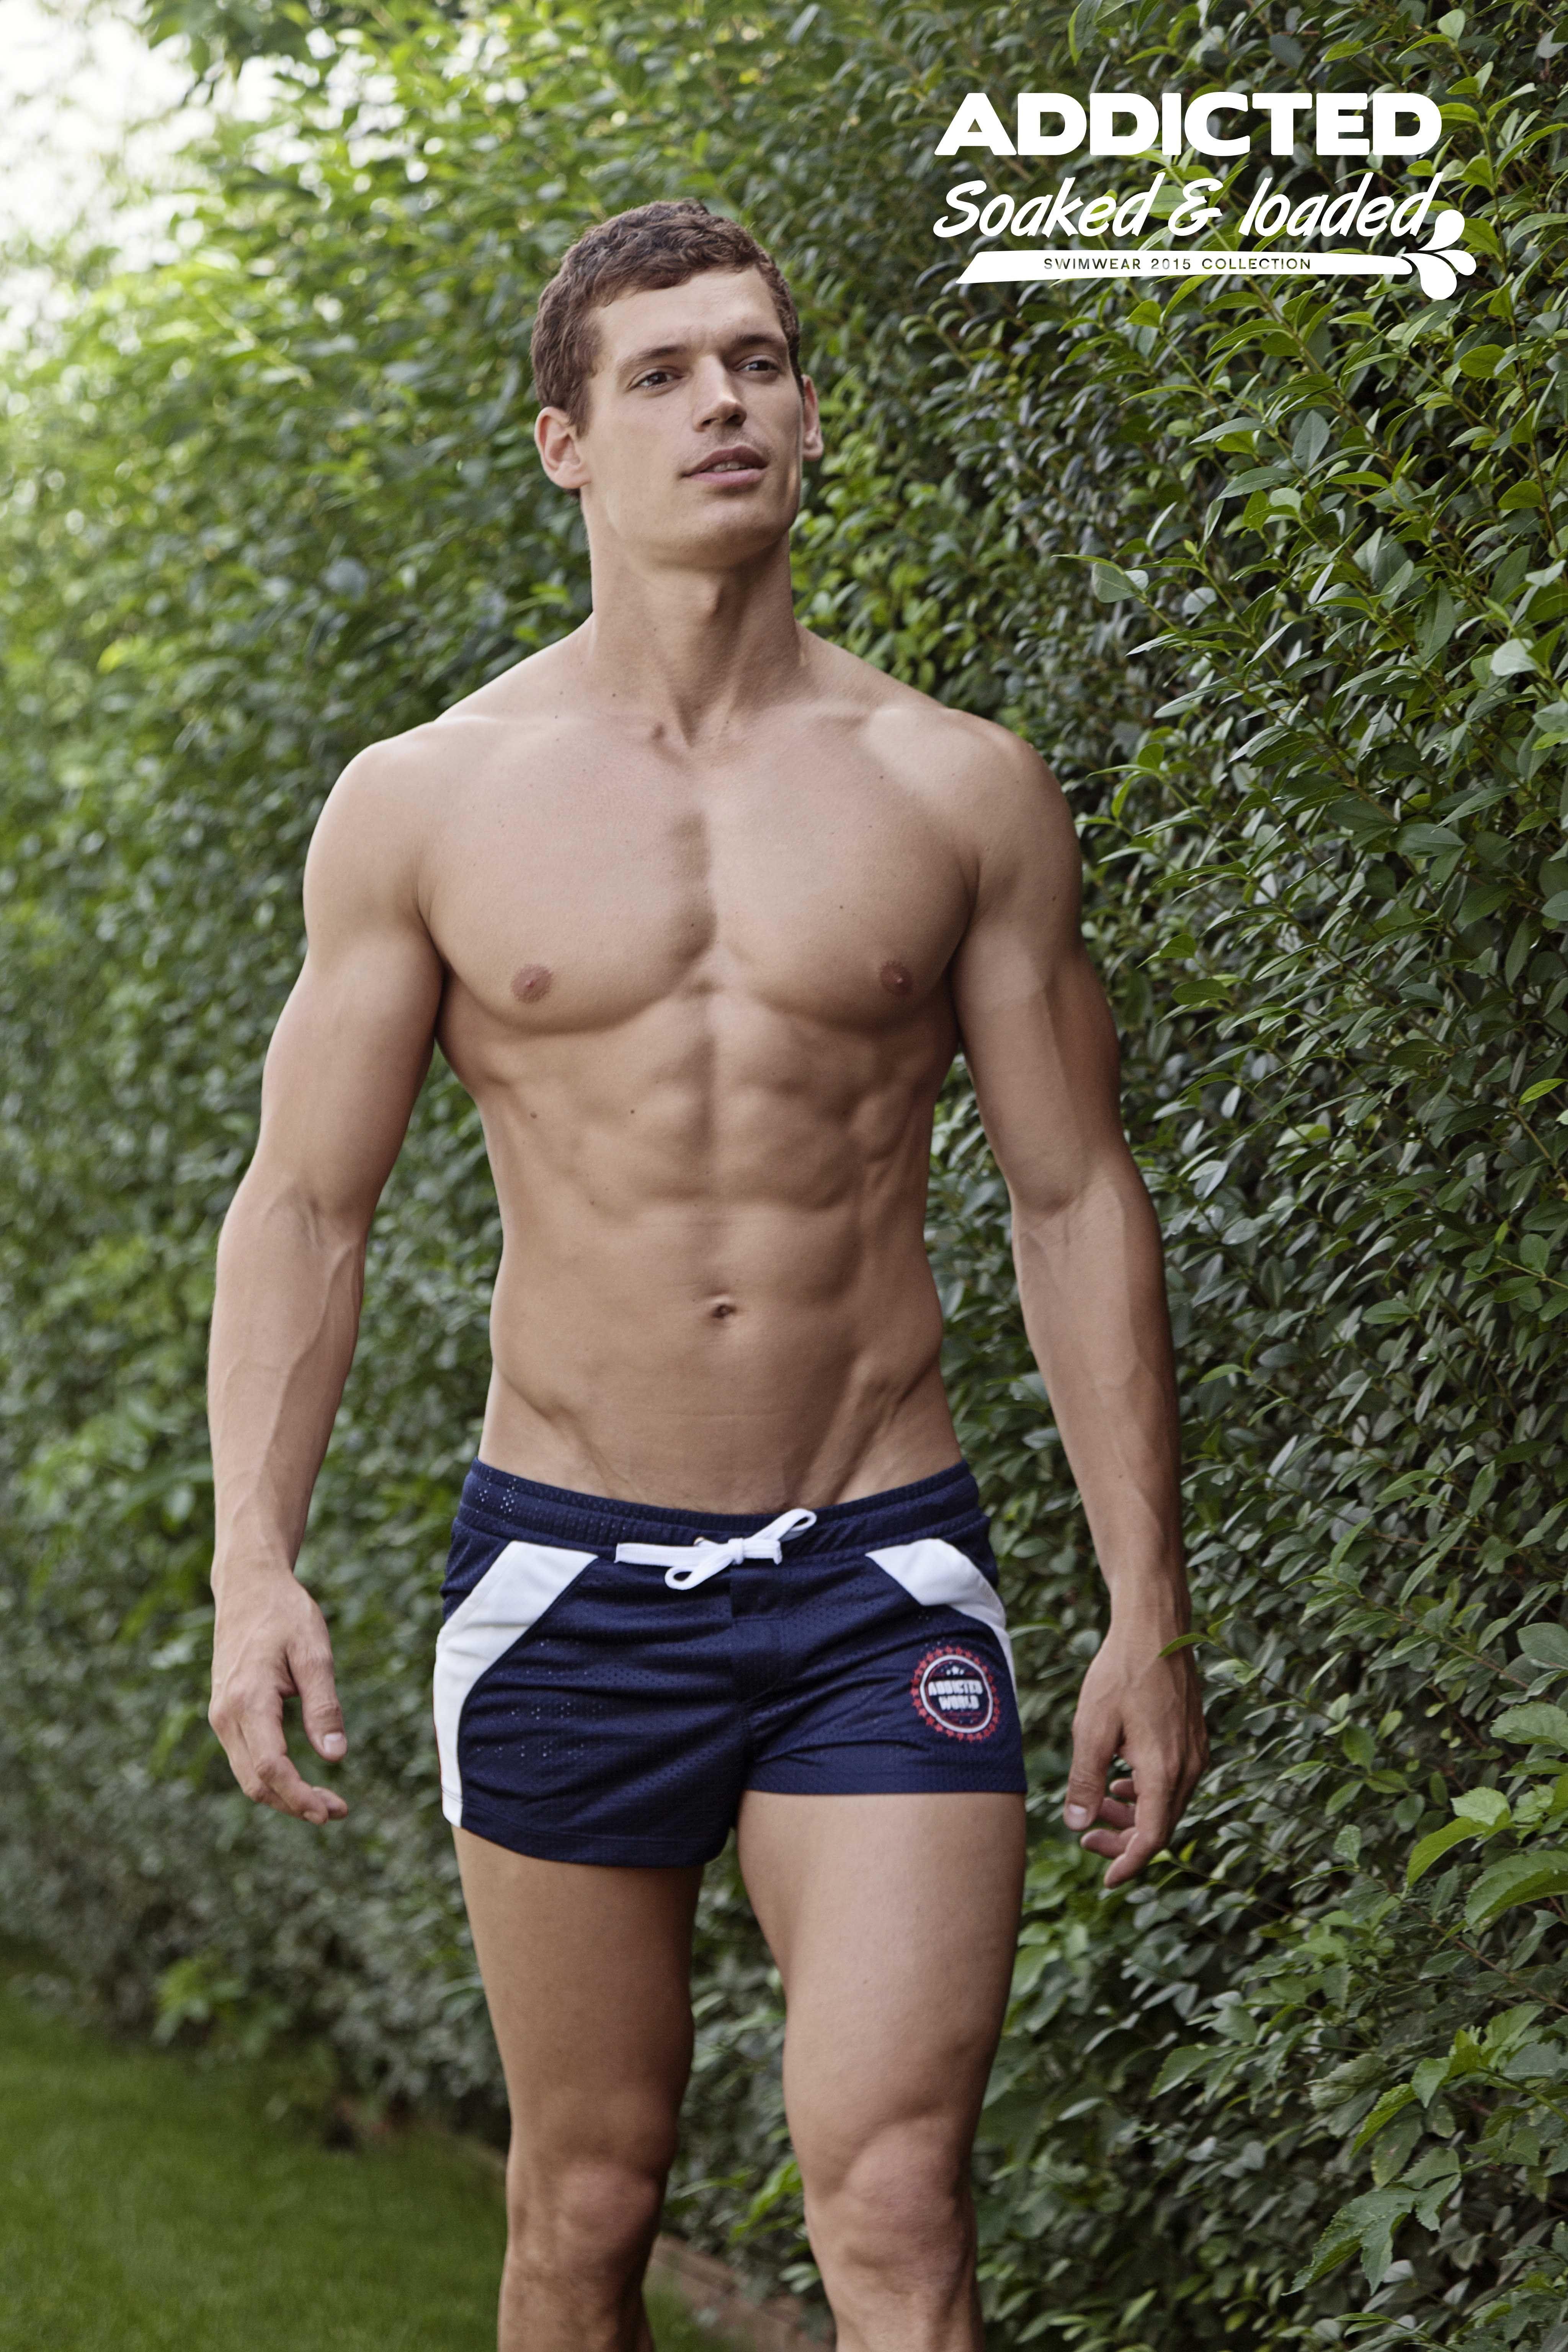 860d4d36edb Jean-Daniel in the ADDICTED World Swim Shorts. Hot! #hot   My Menzzz ...